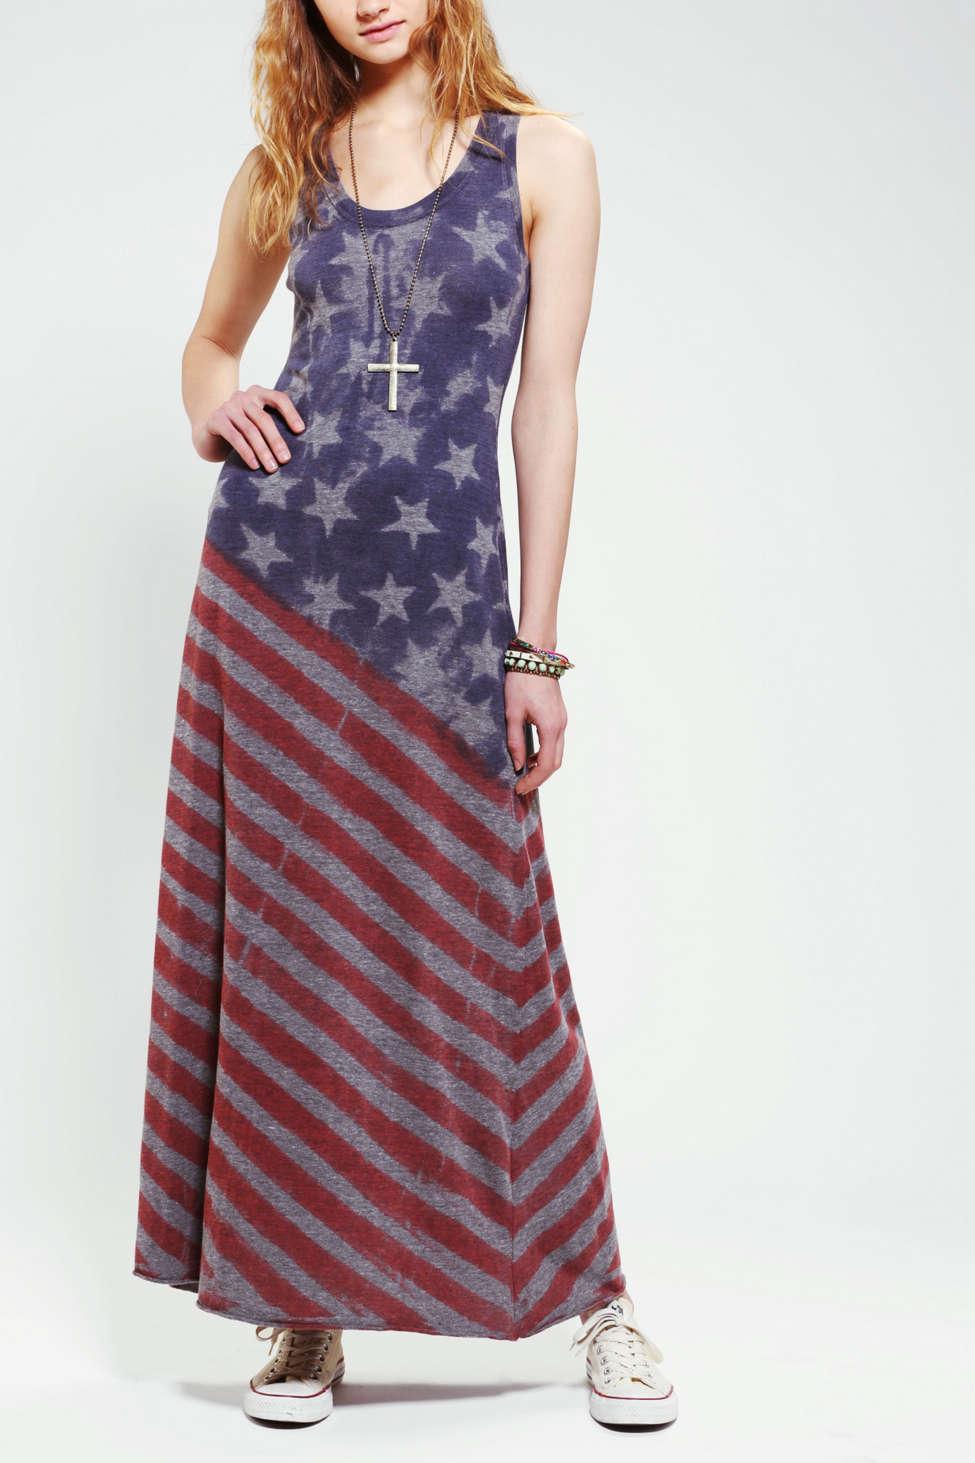 Alternative Flag Racerback Maxi Dress Urban Outfitters